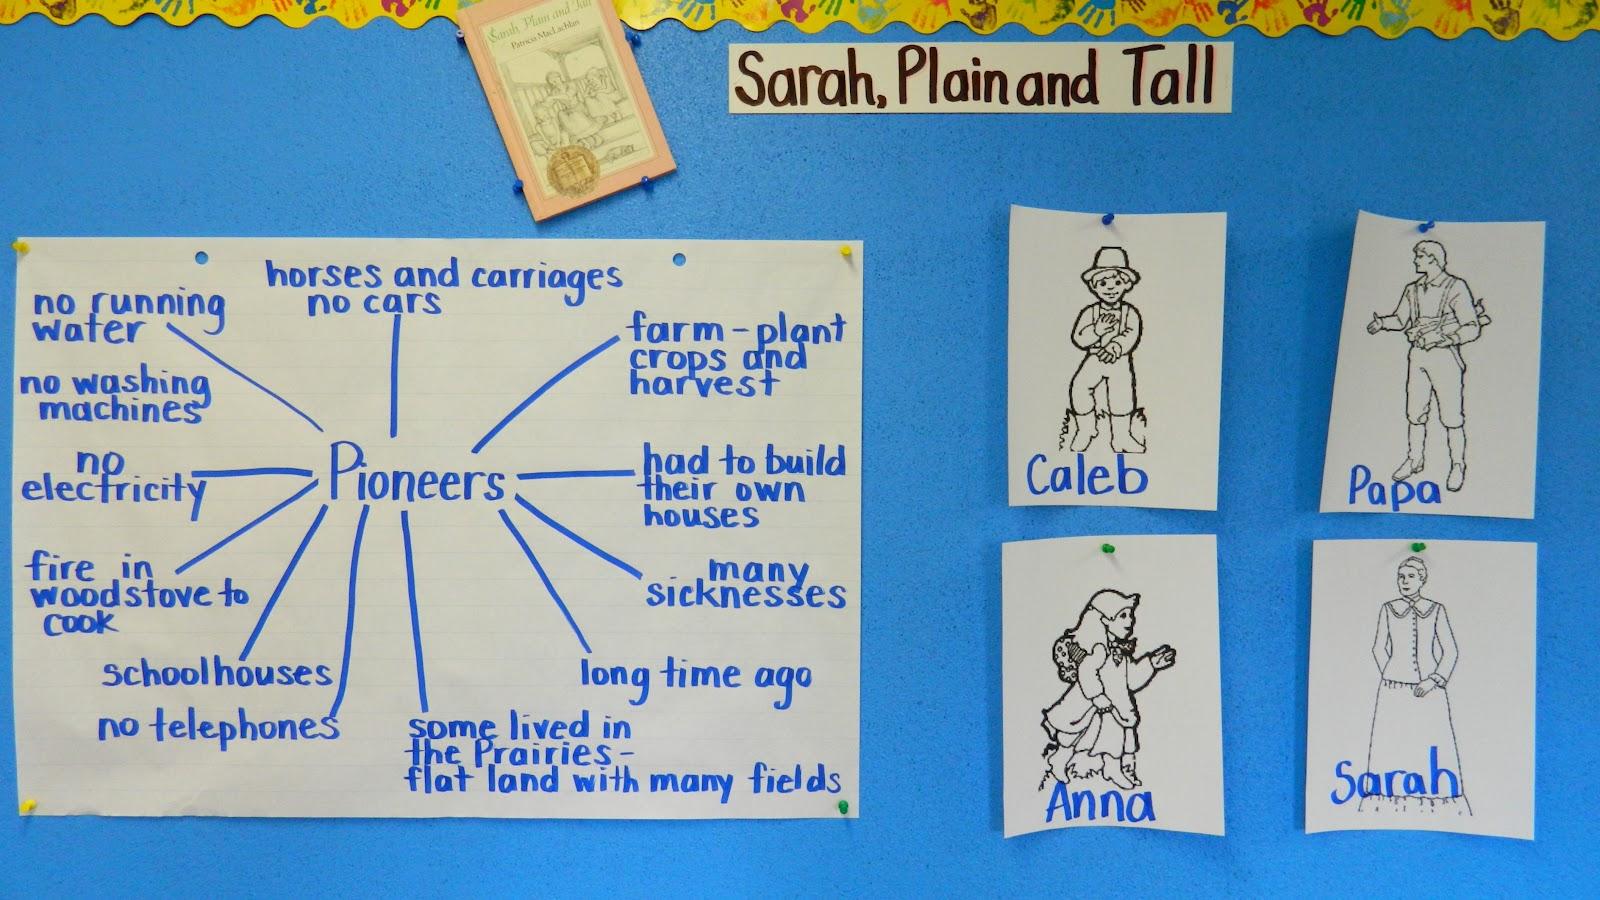 Mrs. Bacchus' Class: Sarah, Plain and Tall